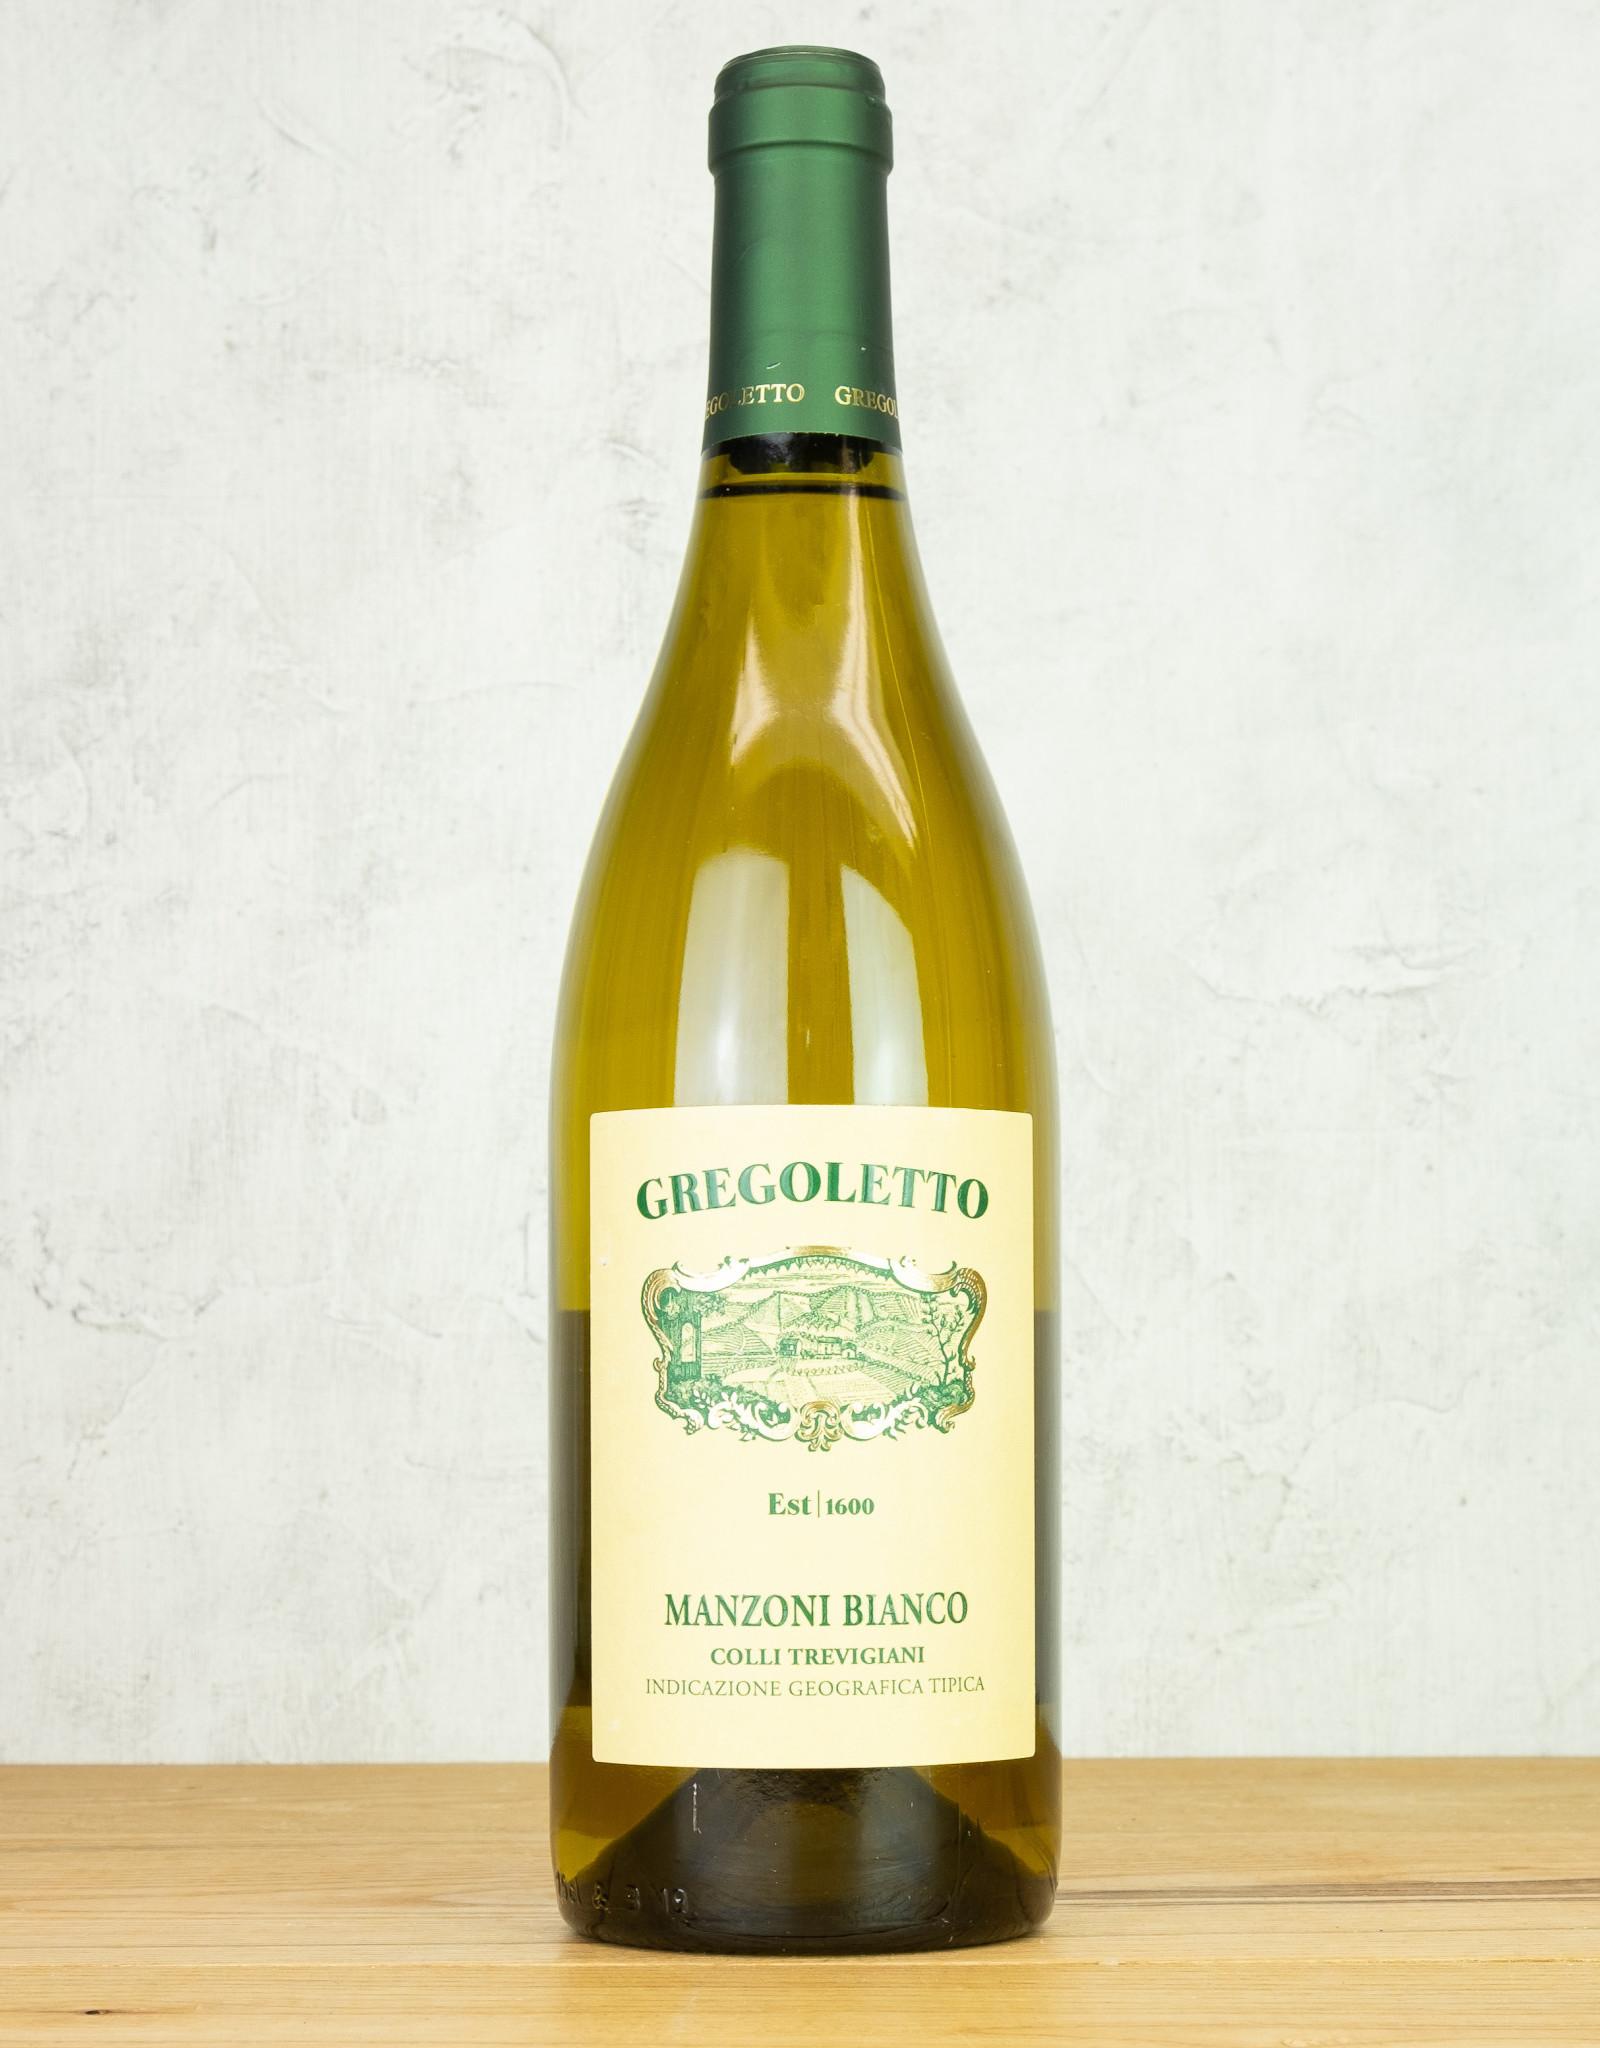 Gregoletto Manzoni Bianco